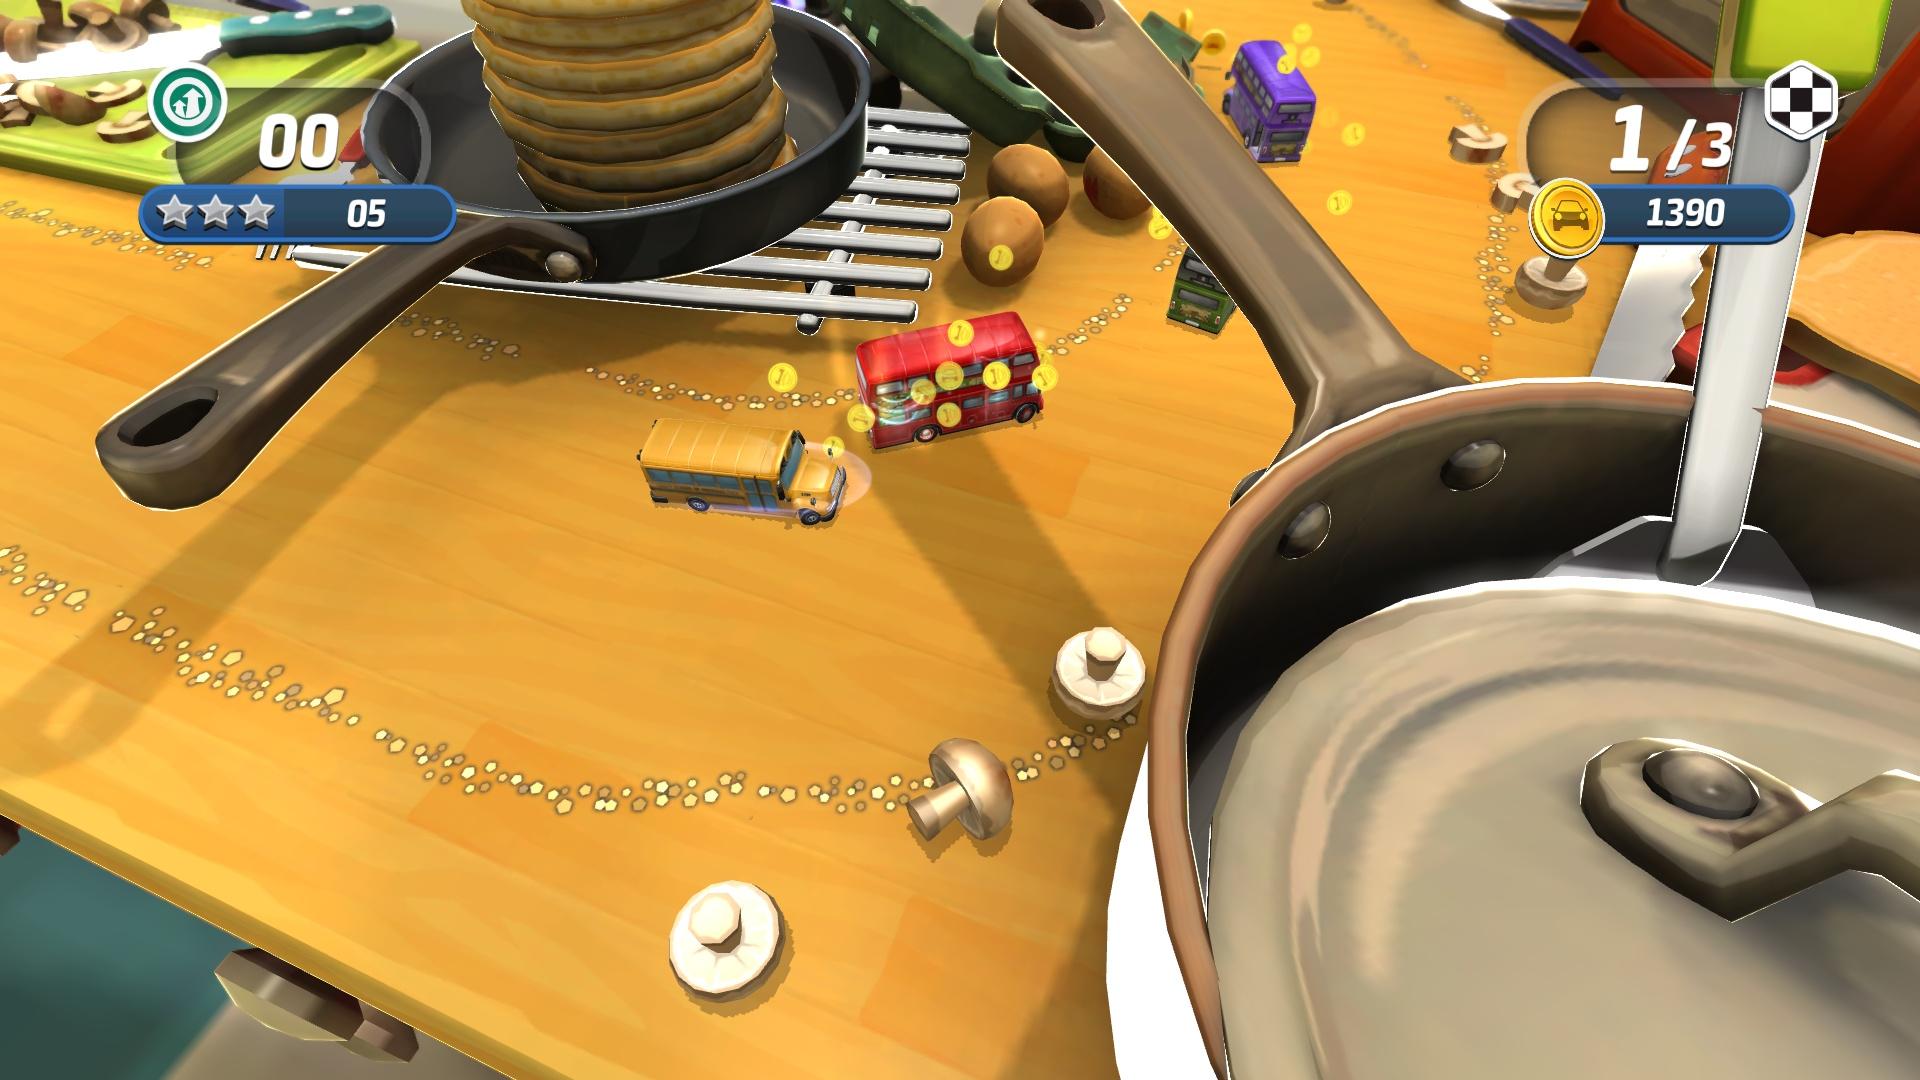 ToyboxTurbos_2015_11_28_22_24_19_624.jpg